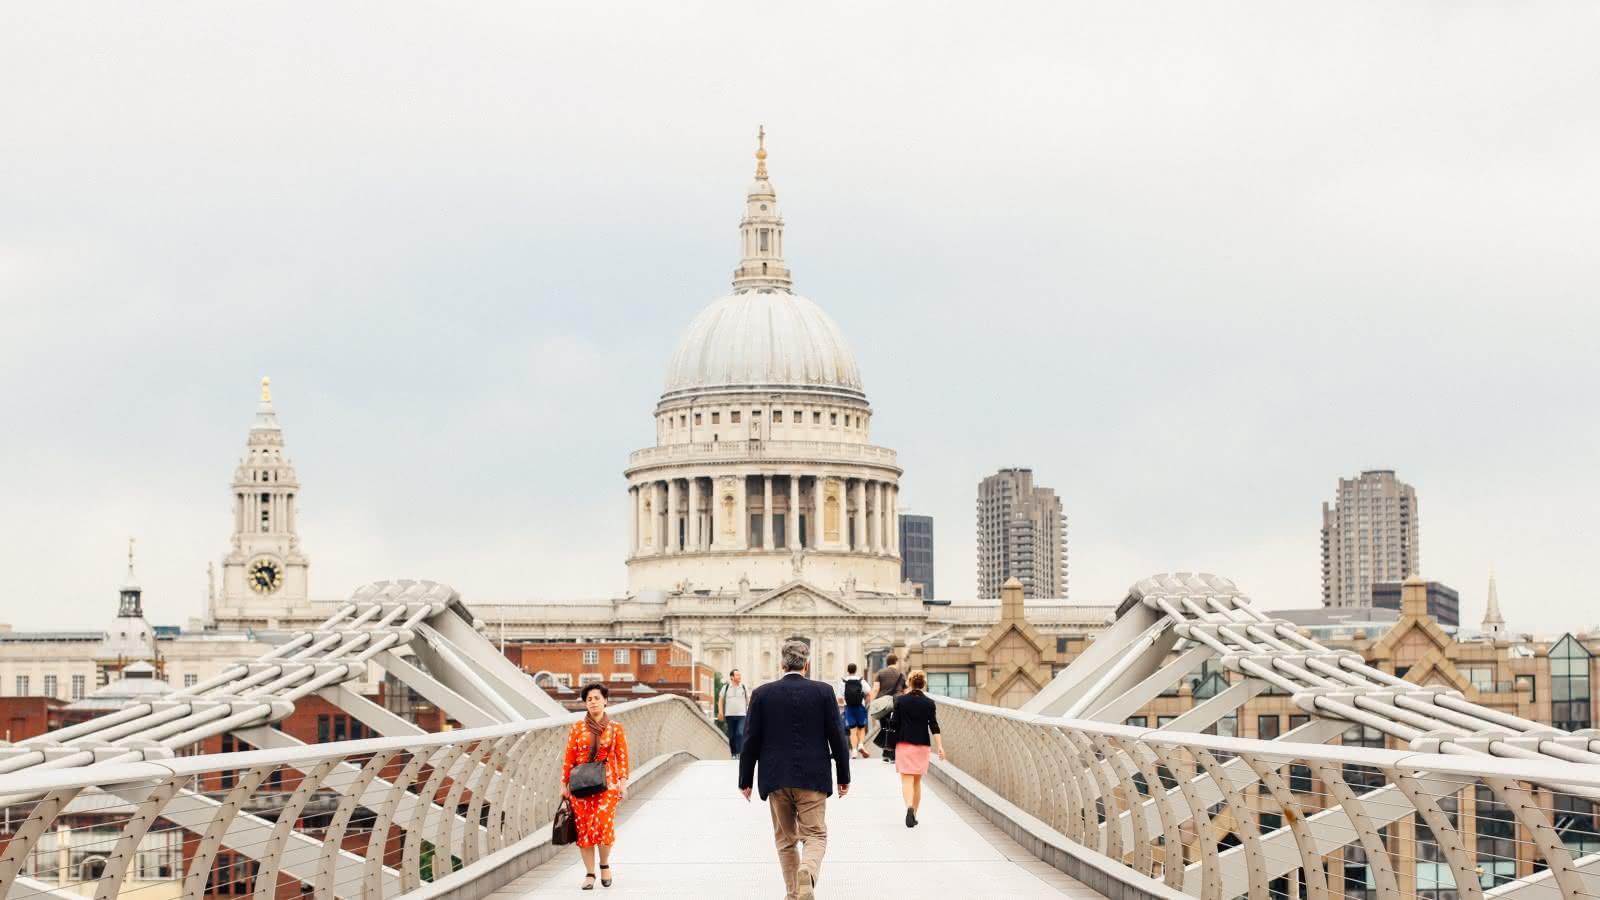 sandemans london walking tours